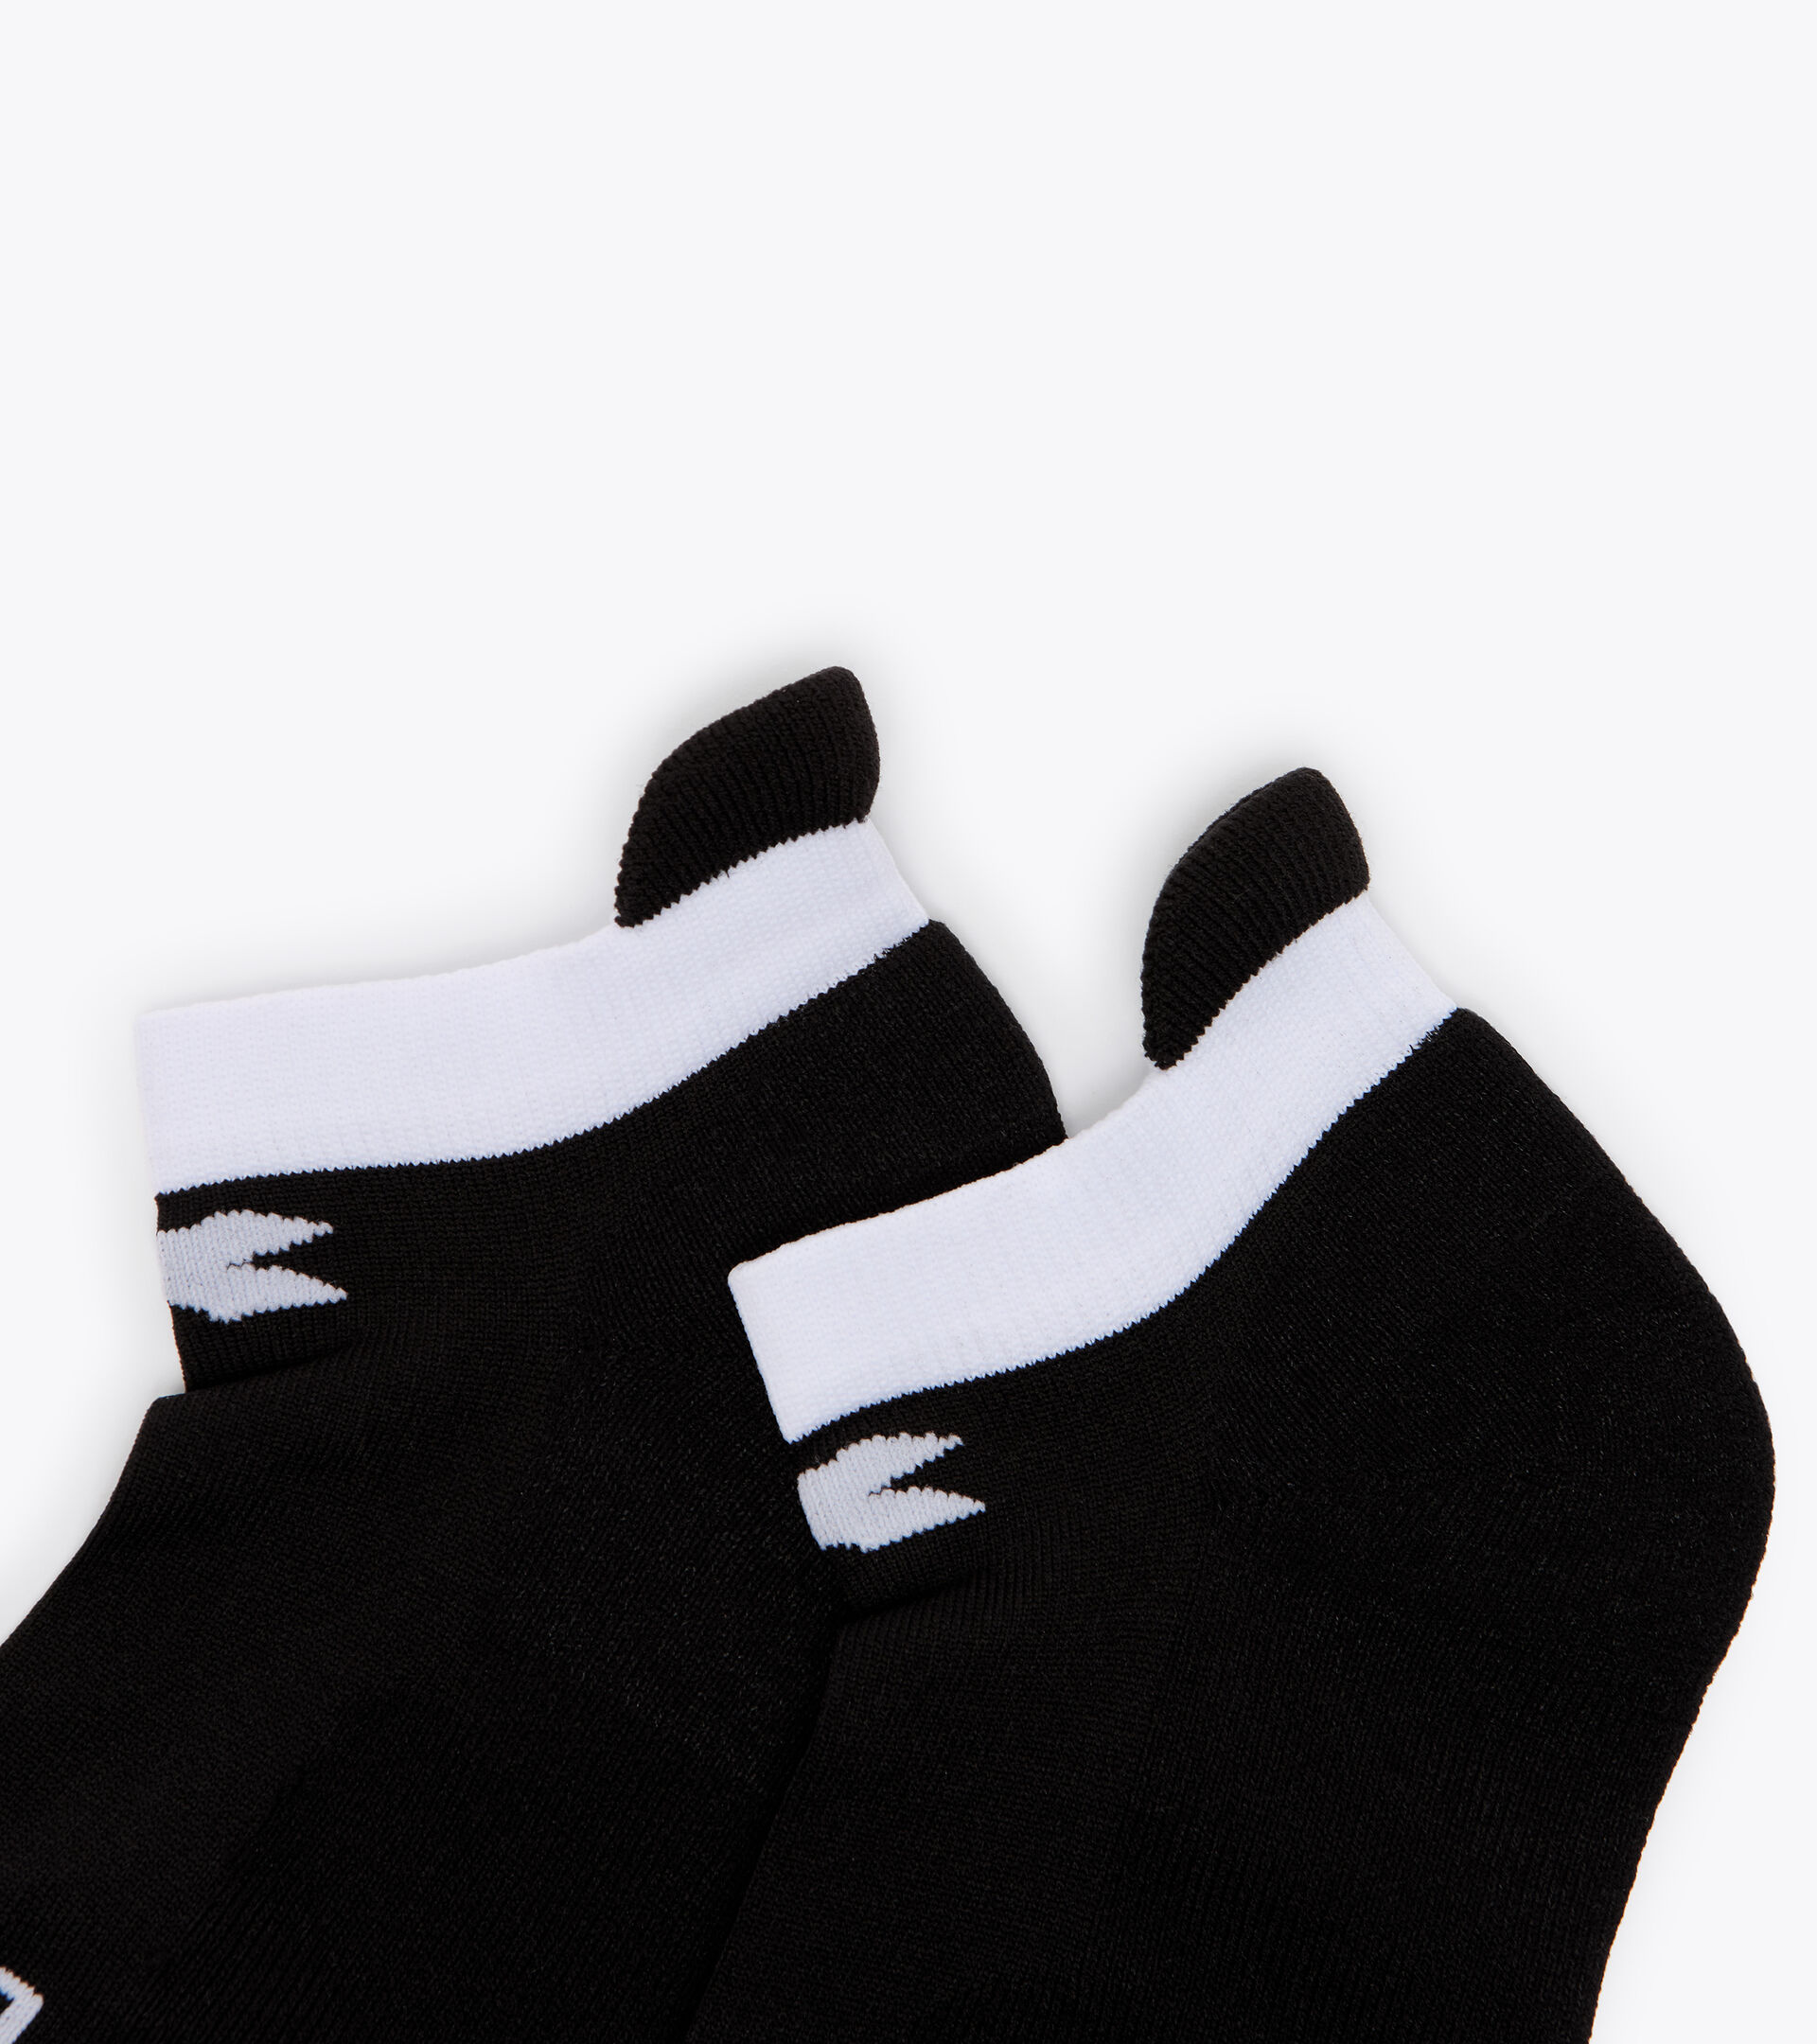 Accessories Sport DONNA L. SOCKS BLACK/OPTICAL WHITE Diadora